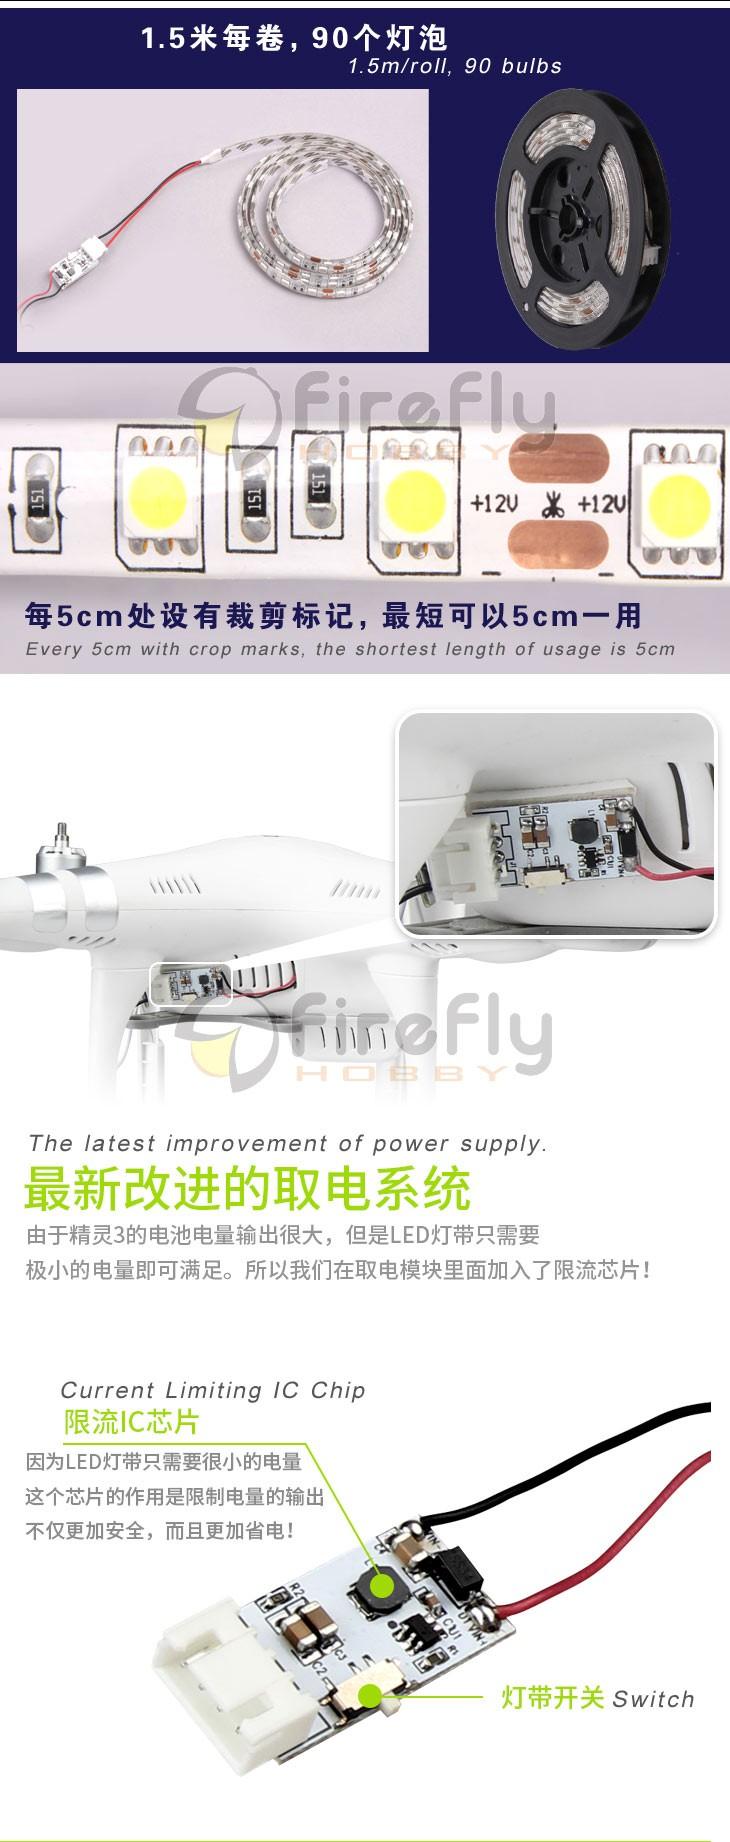 Decorative LED Strip/Belt IC Switch Control R/G/B//W Night Light with Depressurization Module Accessory for DJI Phantom 3